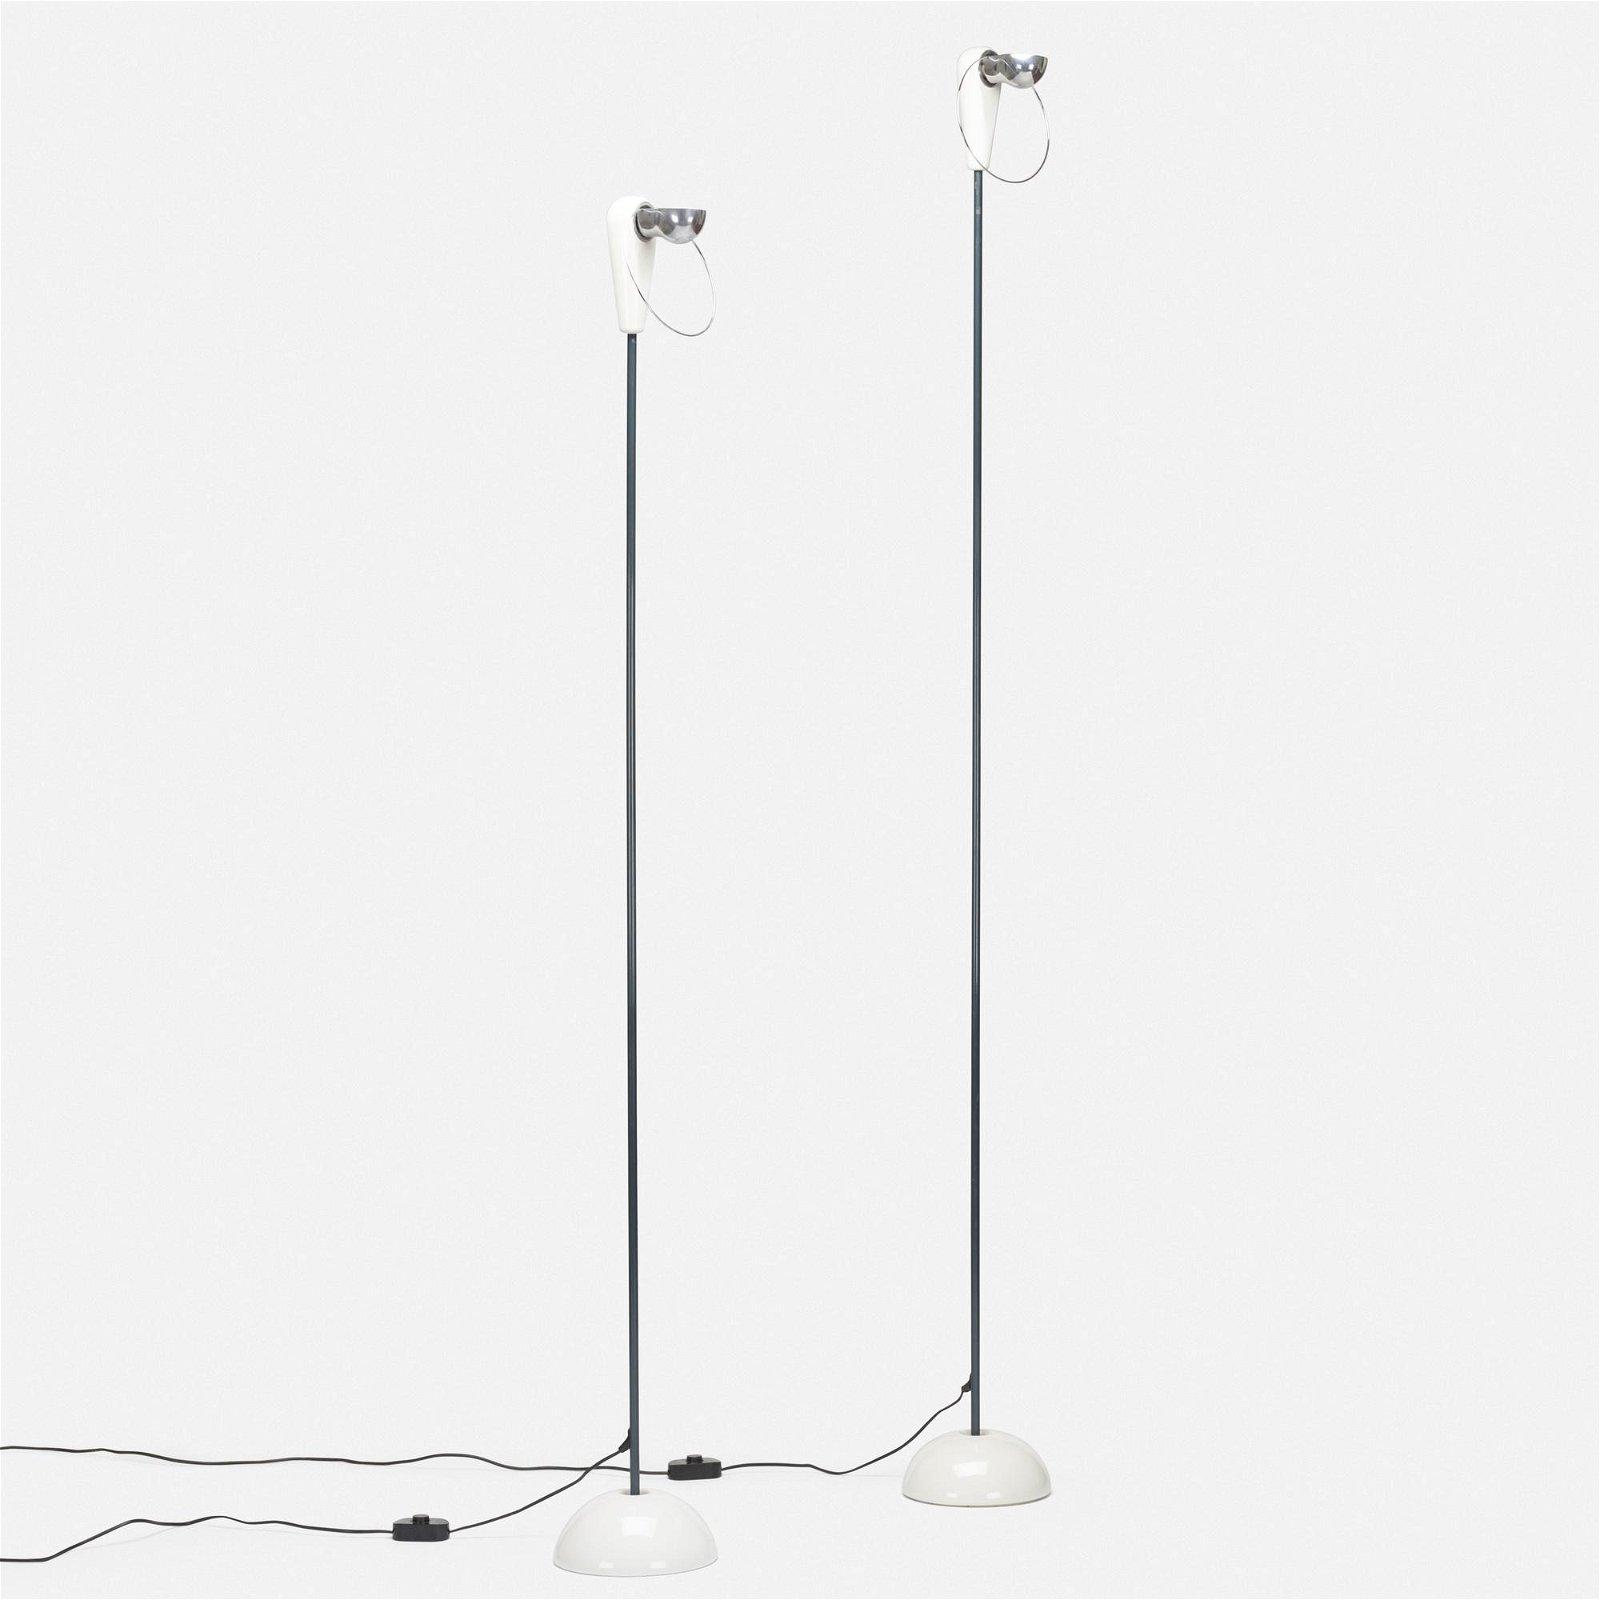 Achille Castiglioni, Bibip floor lamps, set of two